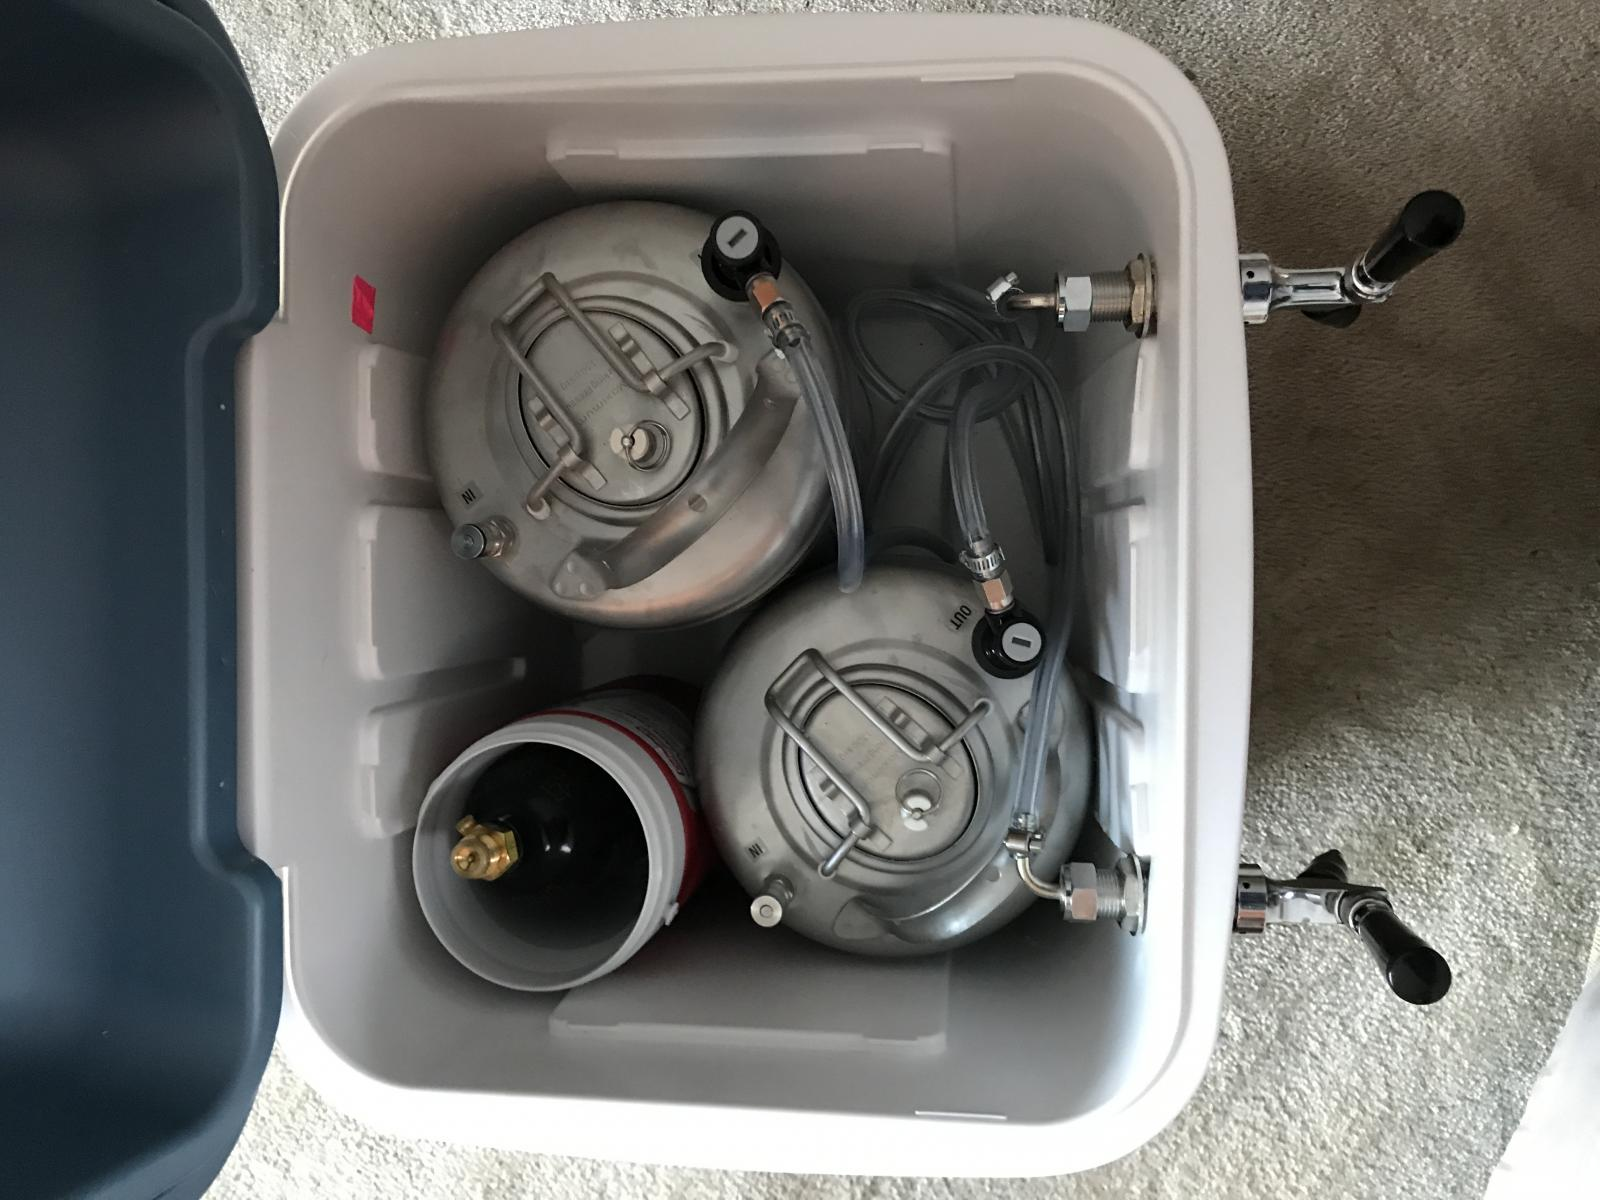 Portable igloo cooler kegerator | Page 13 | HomeBrewTalk com - Beer